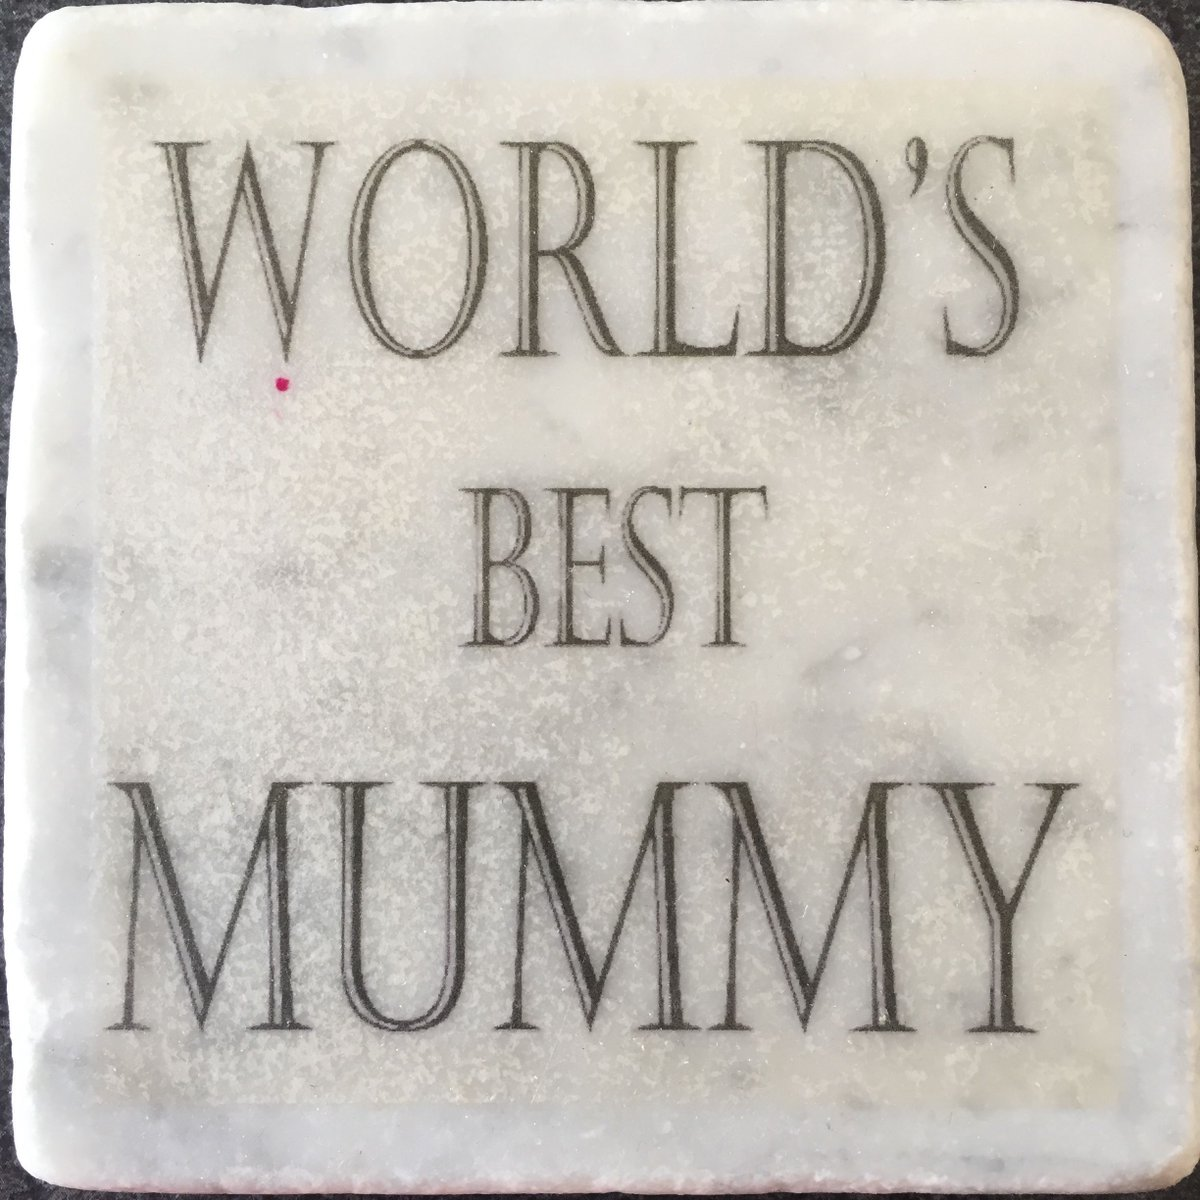 Astuces de Working Mom - PVY065 - Productiv&#39; You!  https:// buff.ly/2va007n  &nbsp;   #Repost  #workingmom #mamanactive #femmes #Famille <br>http://pic.twitter.com/h7lb9DM1hO